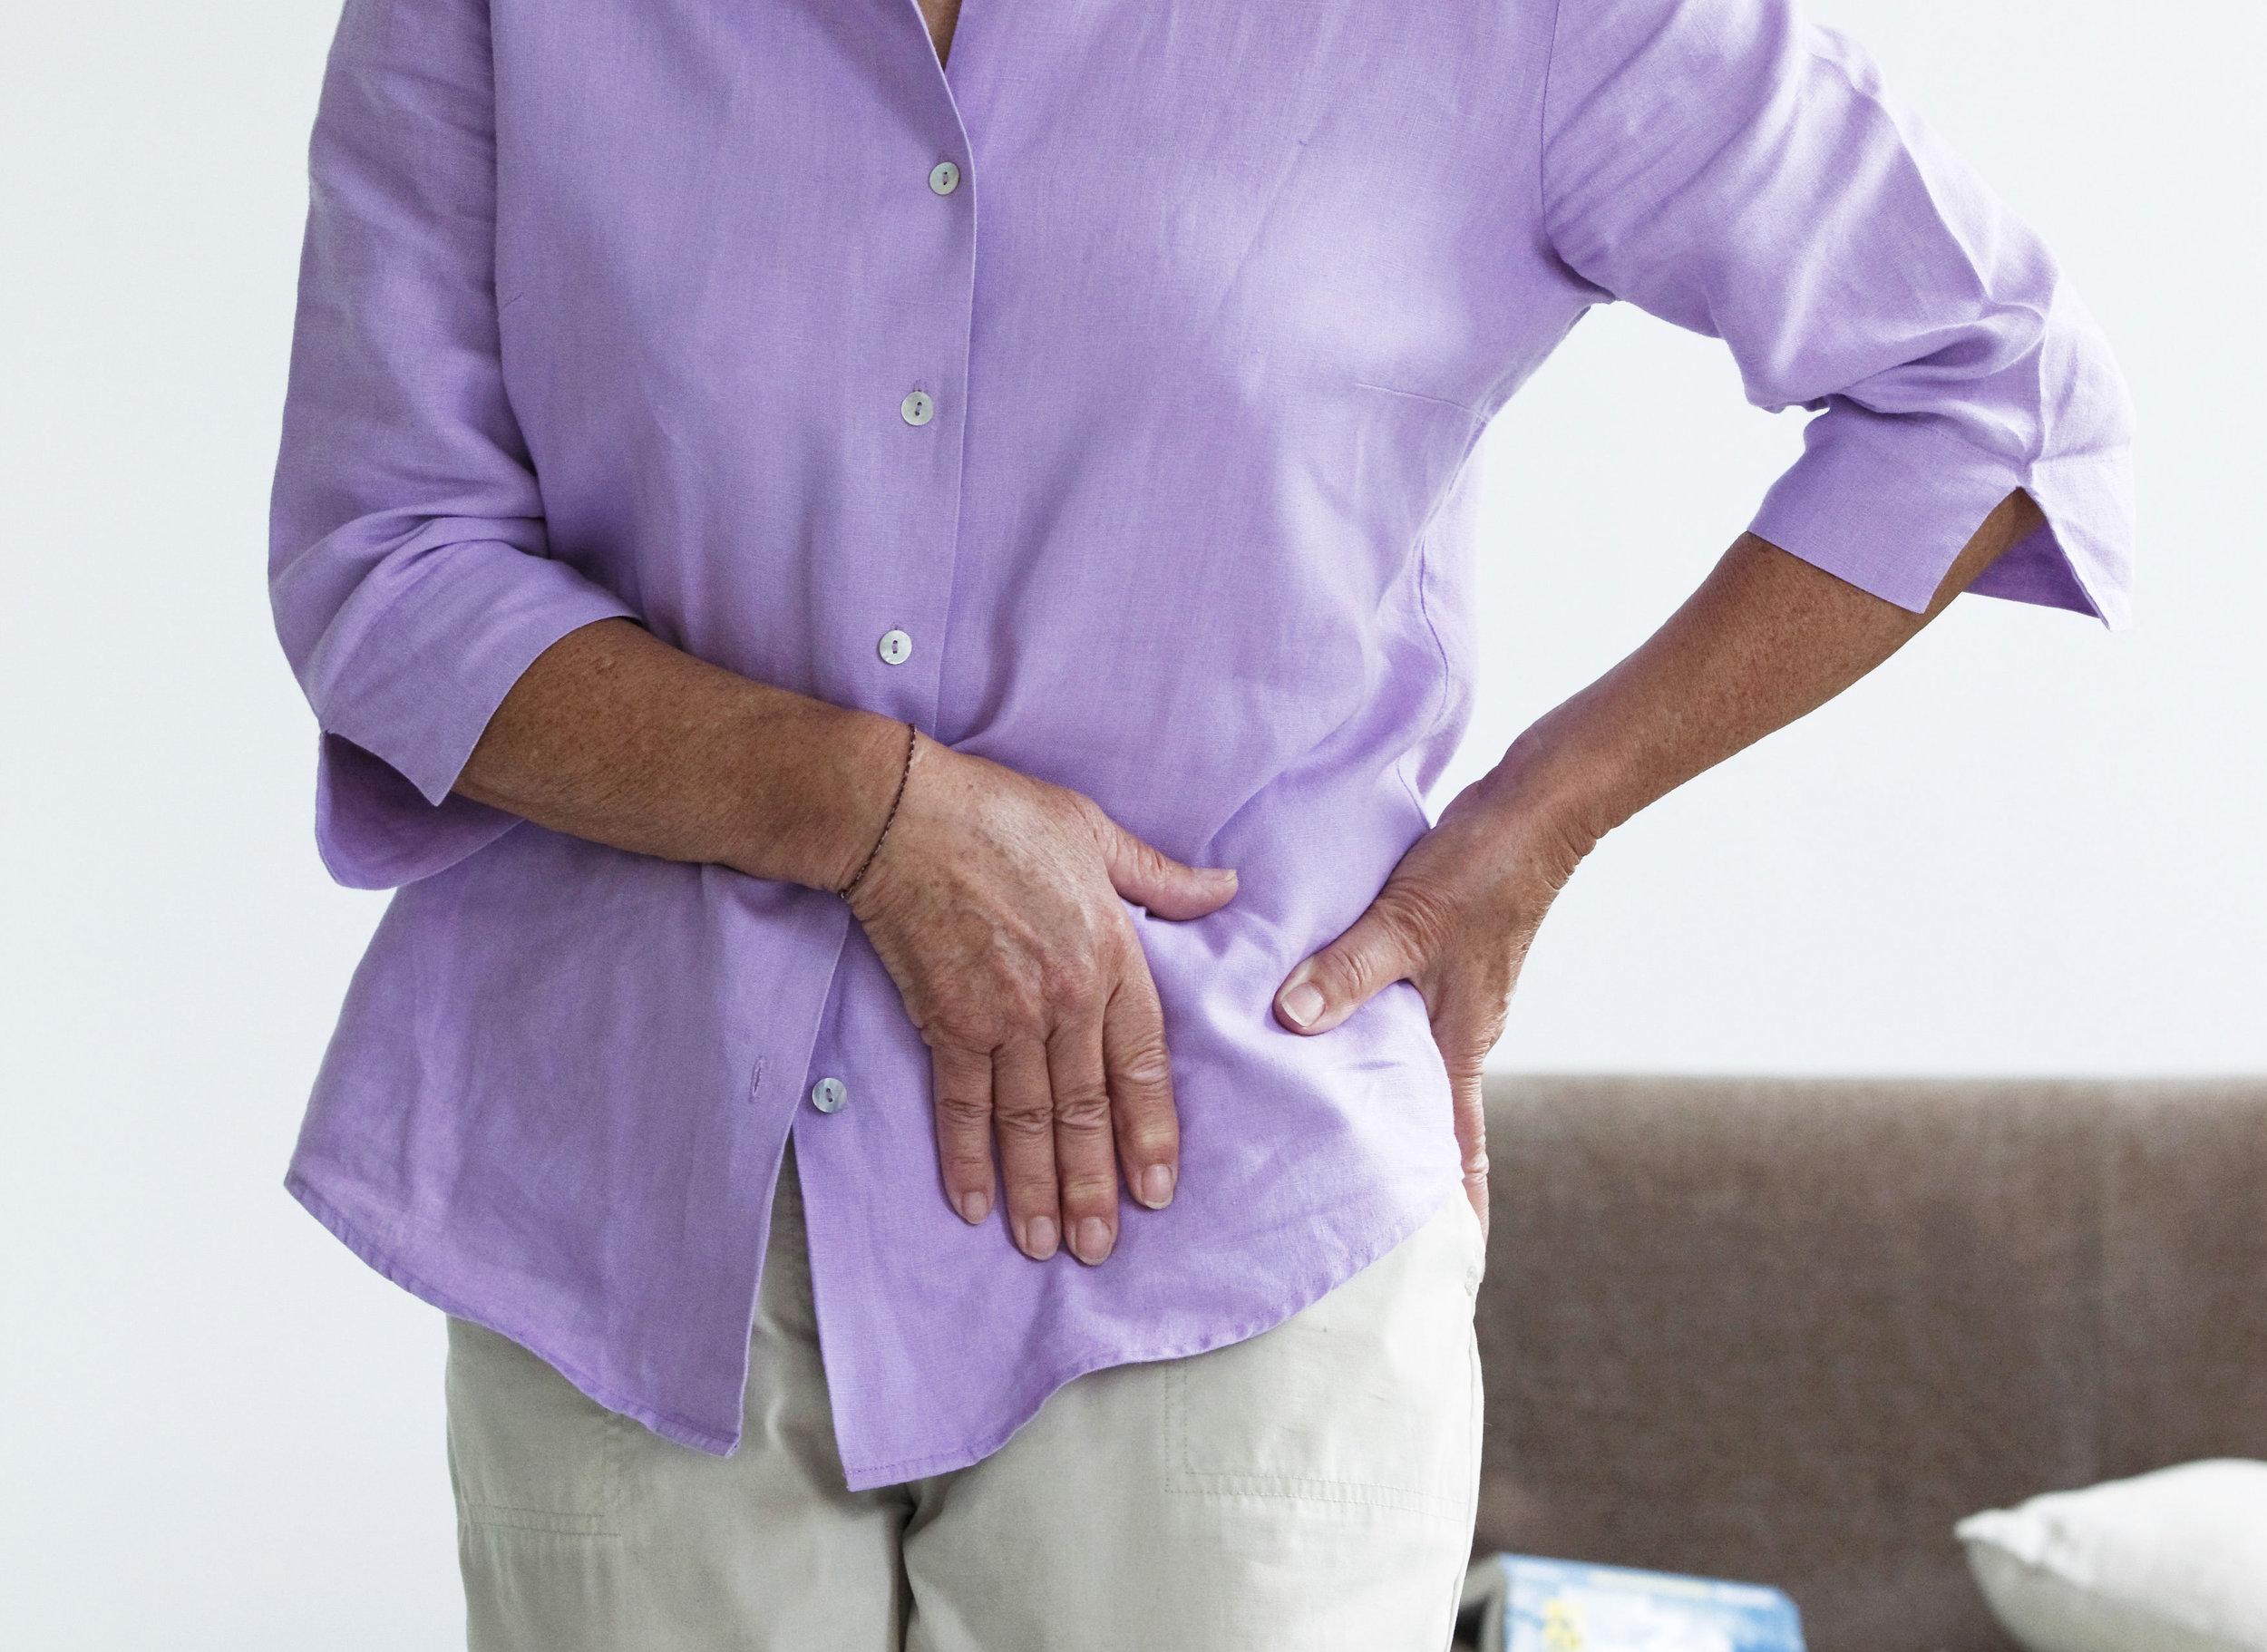 Lateral-Hip-Pain-Trochanteric-Bursitis-Treatment.jpg